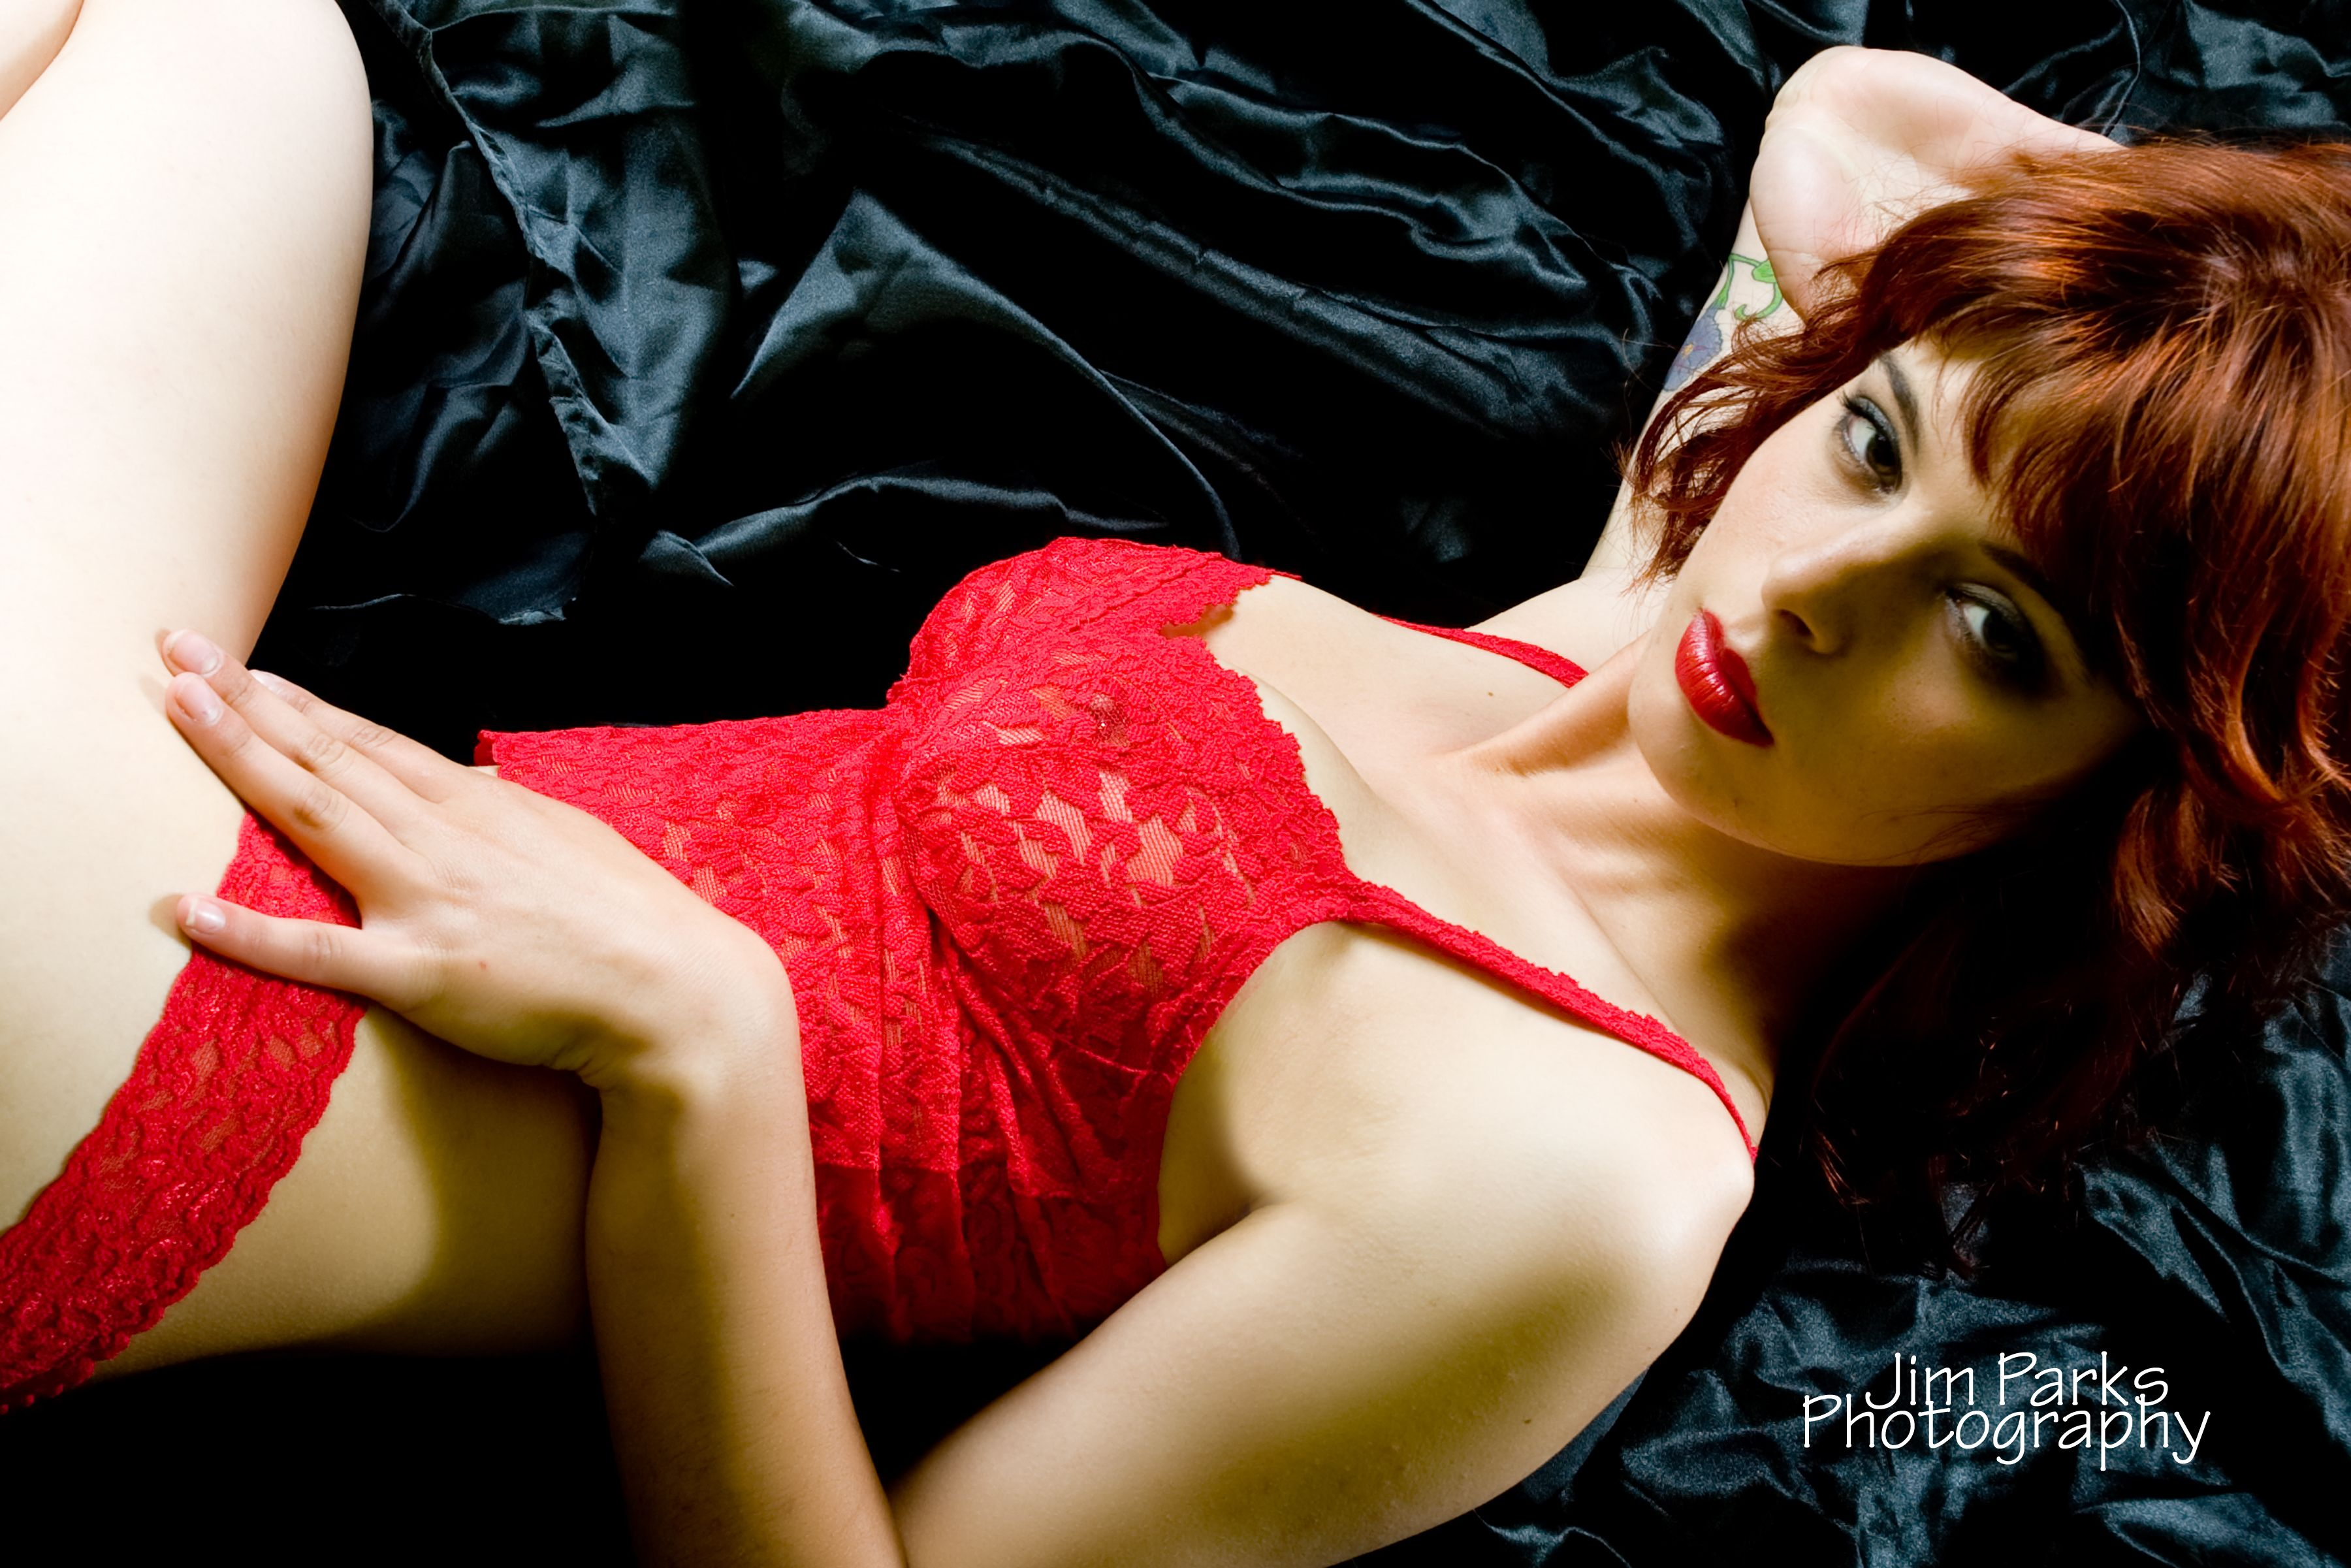 azura starr | favorite redheads | pinterest